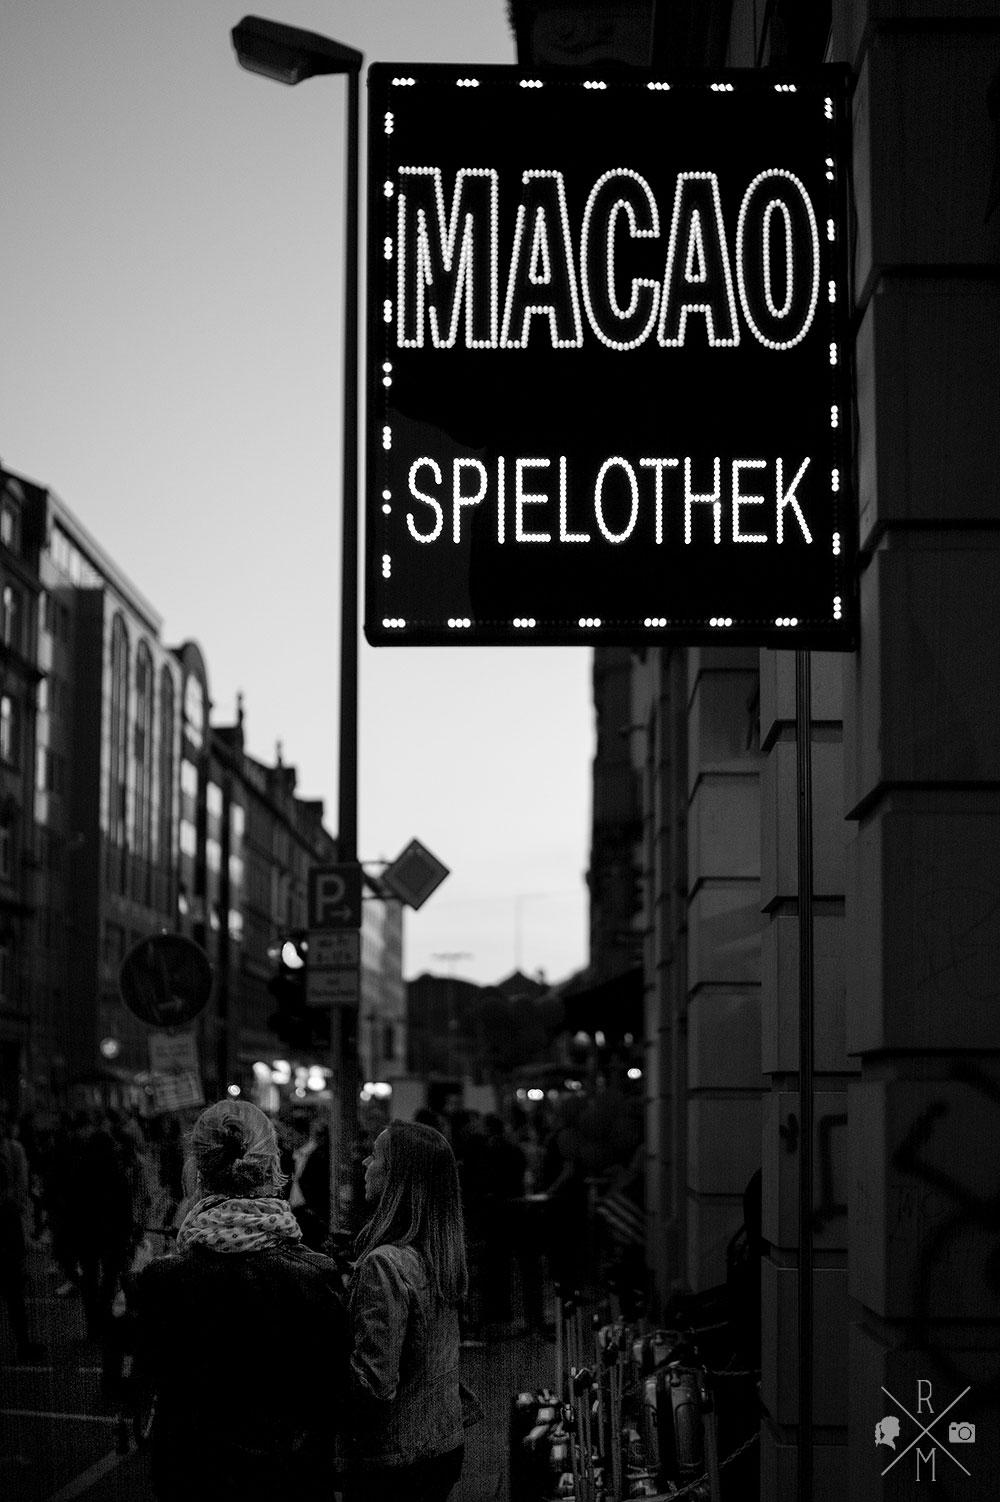 MainMittwoch: Feiern im Frankfurter Bahnhofsviertel | relleomein.de #mainmittwoch #frankfurt #bahnhofsviertel #bhvn8